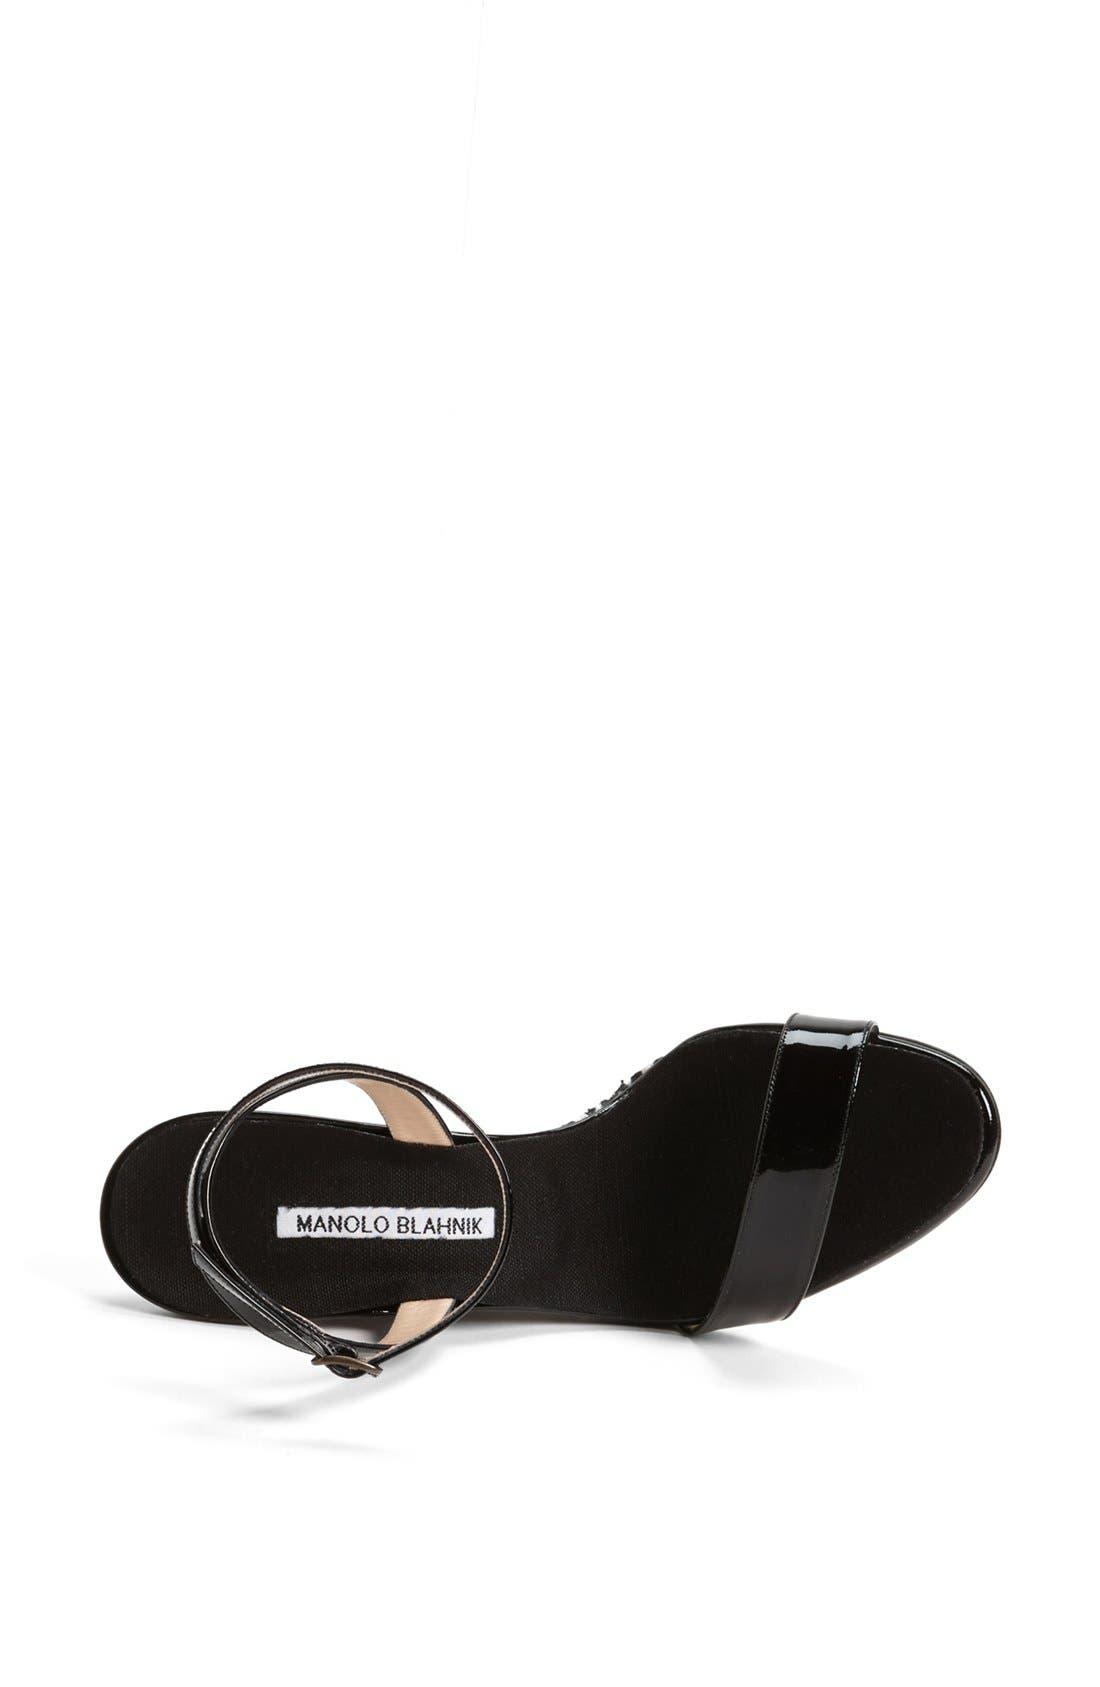 Alternate Image 3  - Manolo Blahnik 'Ribera' Wedge Sandal